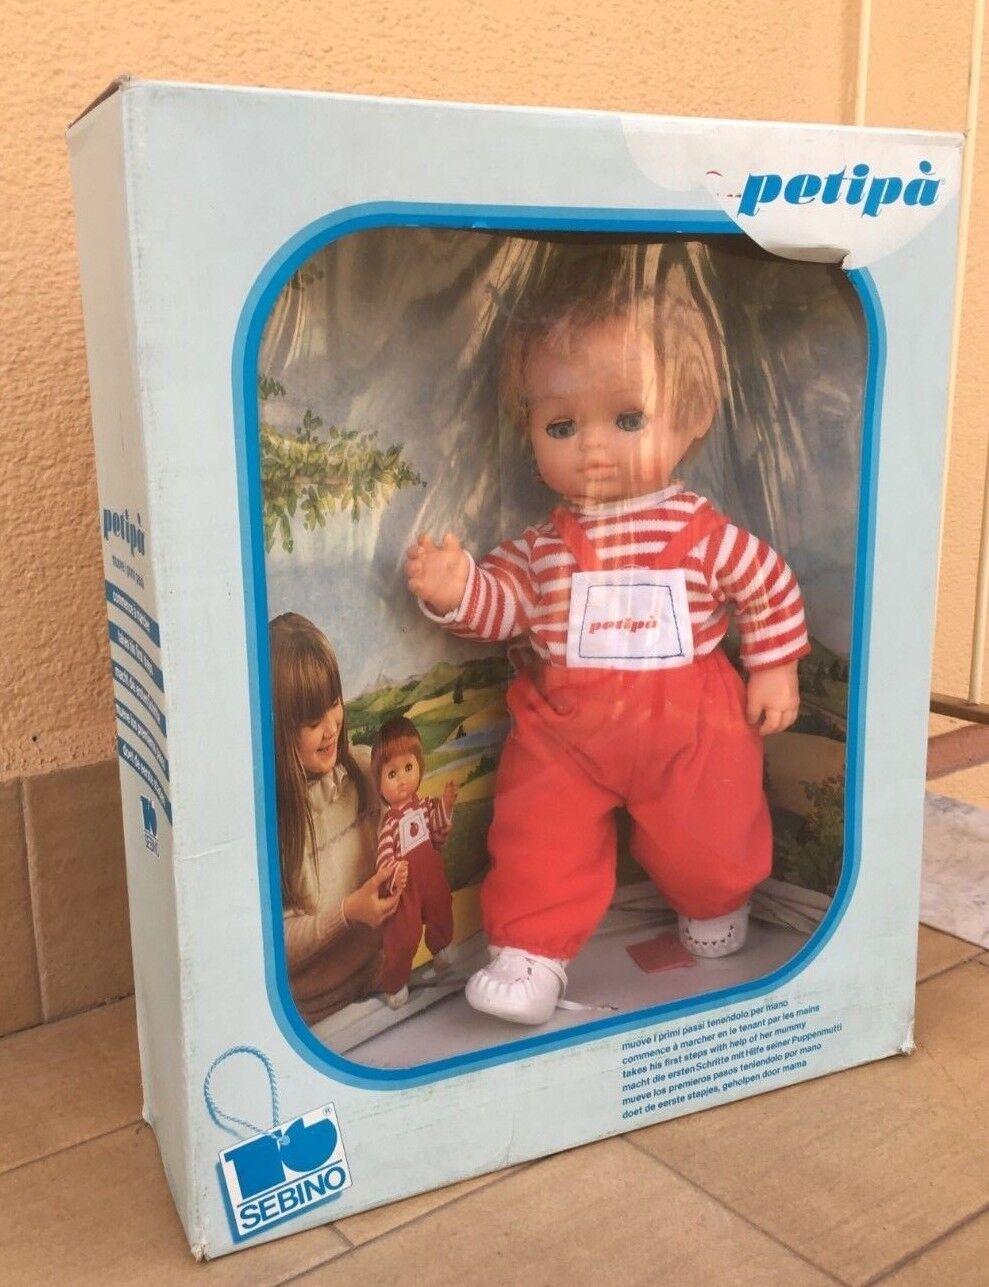 (bambola petip à petipa petipa  cammina tenendolo pro mano anni '80'